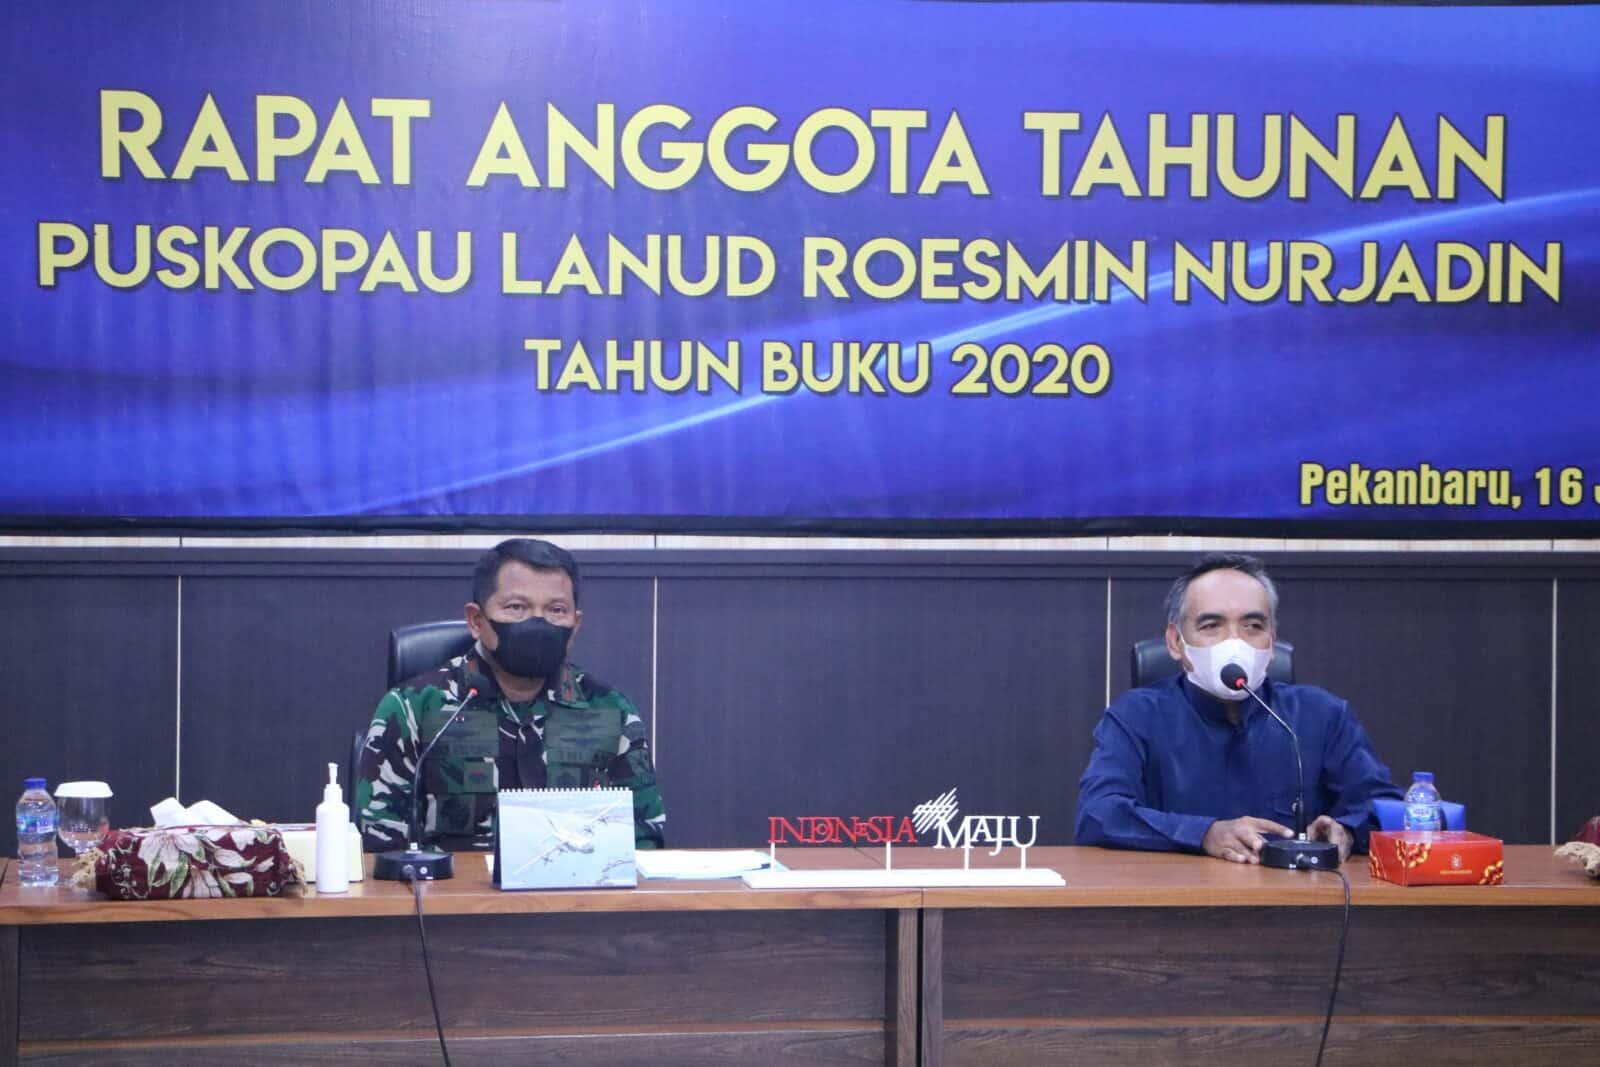 16. Dimasa Pandemi Pengurus Koperasi Harus Berinovasi 5